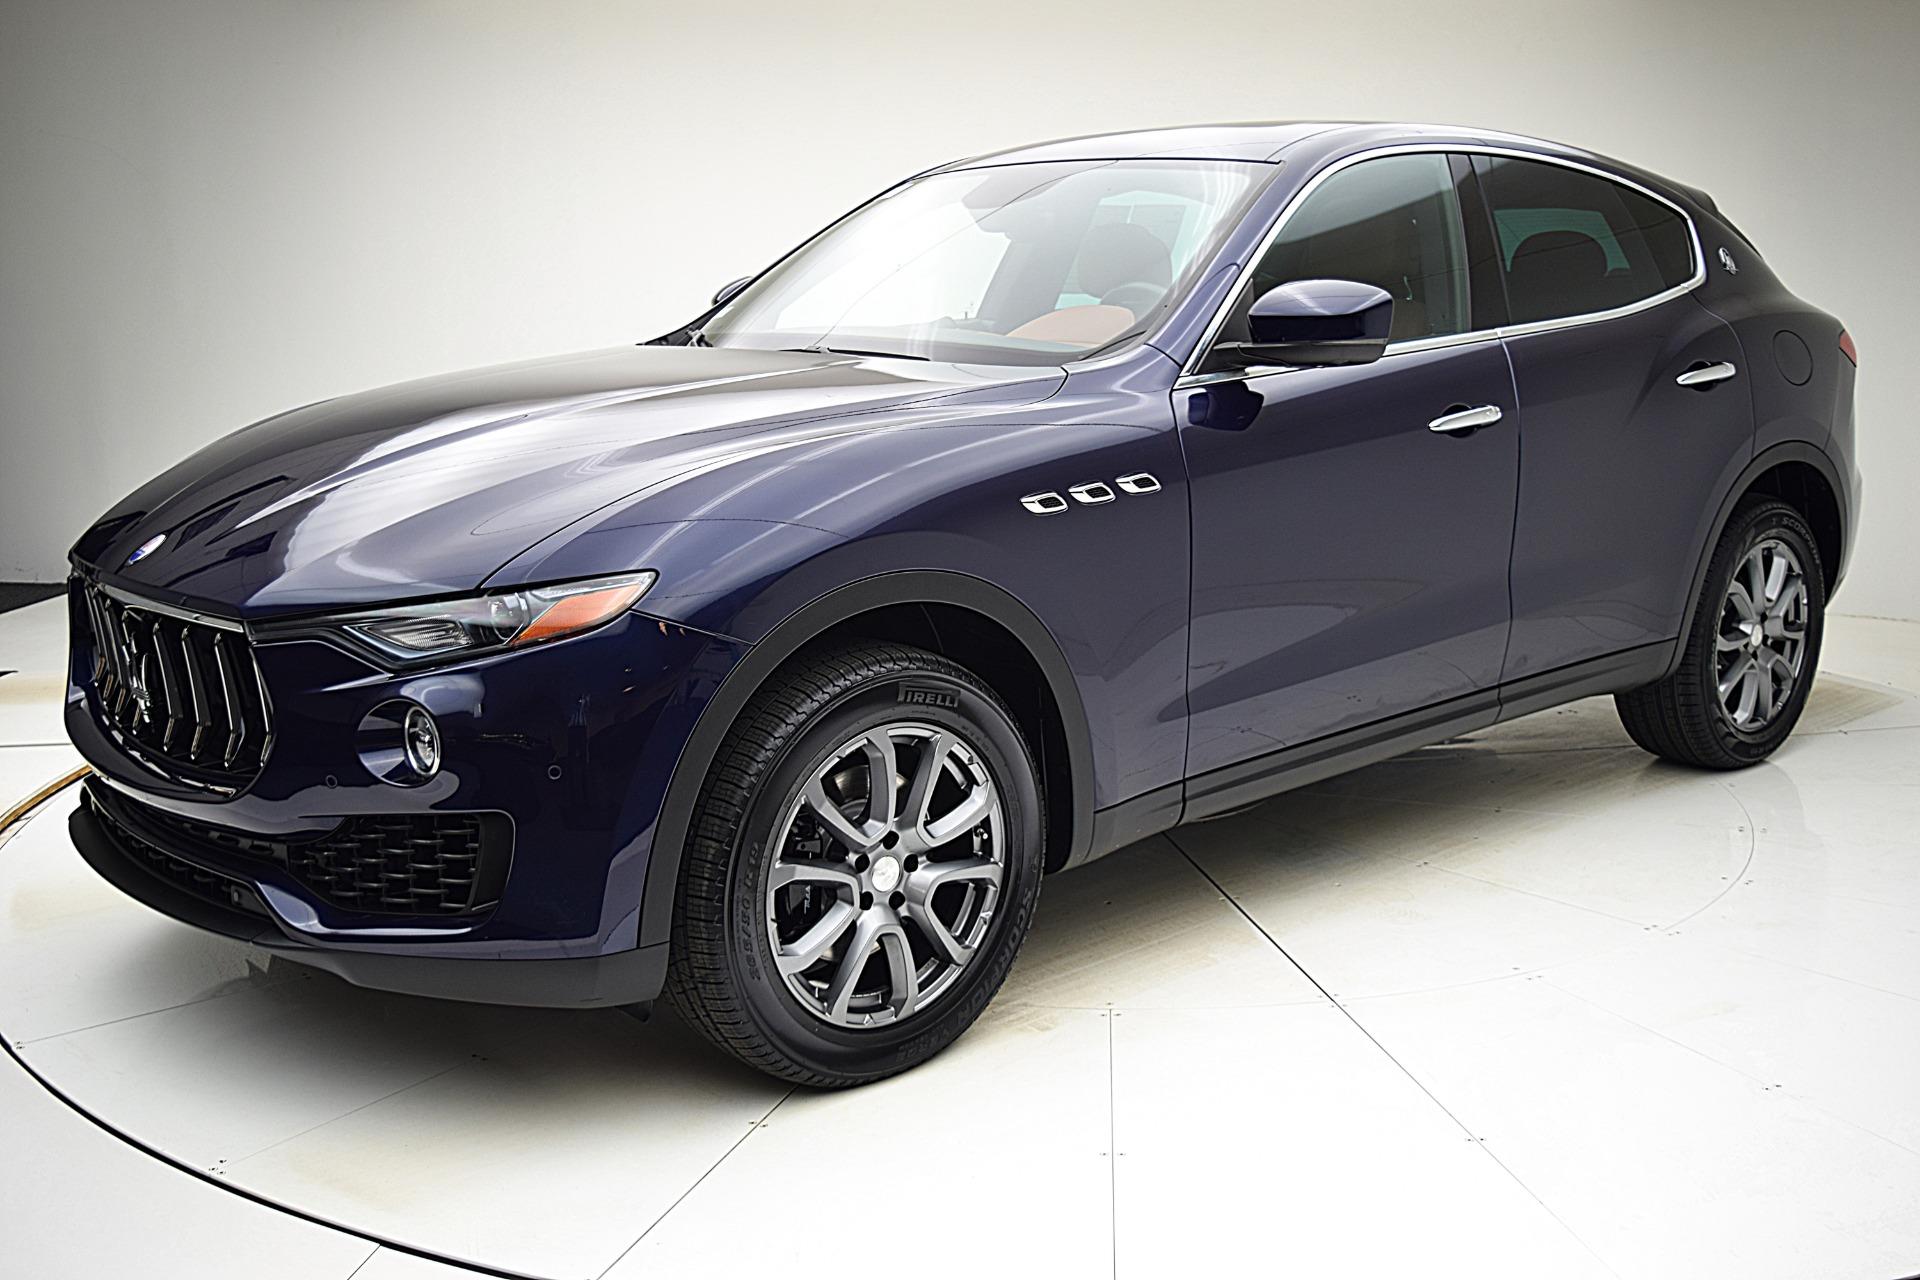 Used 2018 Maserati Levante for sale $59,880 at Bentley Palmyra N.J. in Palmyra NJ 08065 2